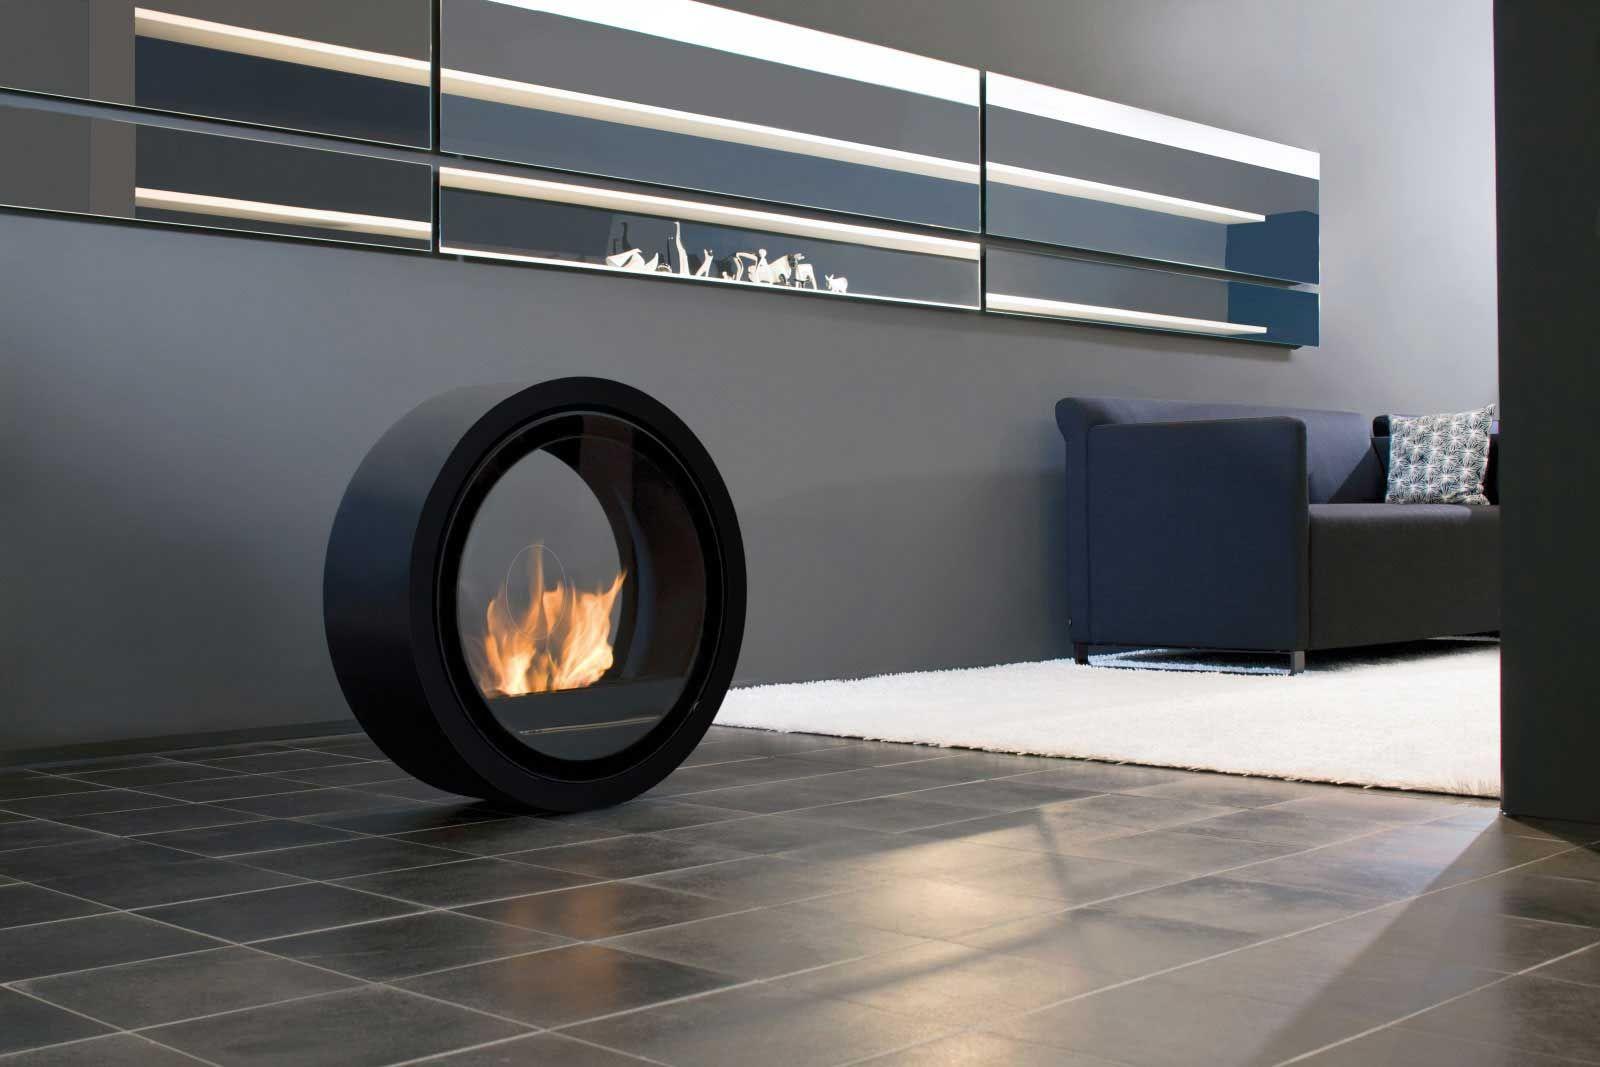 Conmoto Ethanol Kamin Roll Fire Kaufen Im Borono Online Shop Sieger Design Aussenkamin Kamin Modern